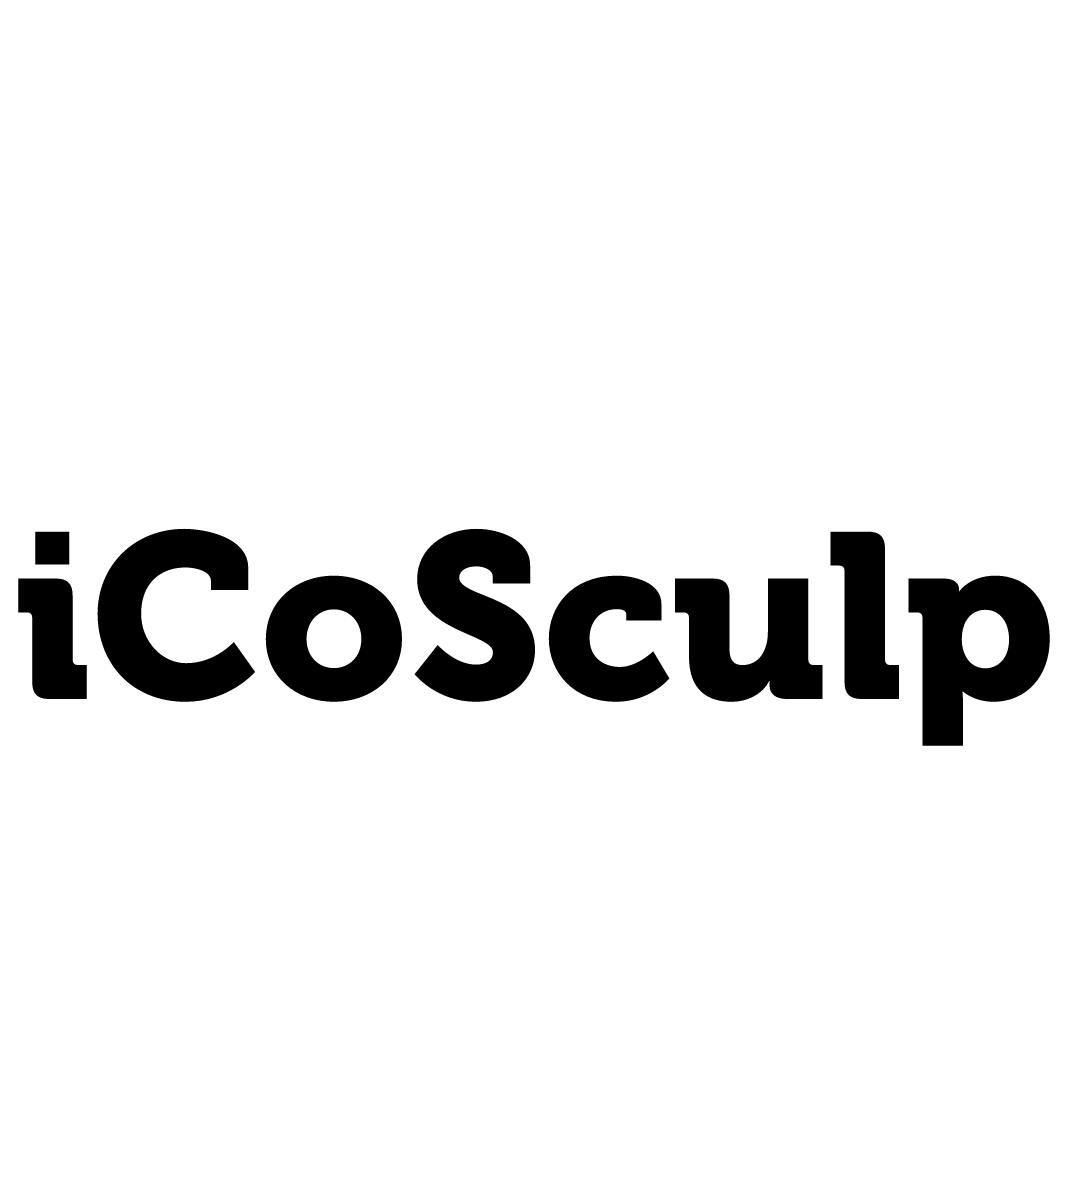 icoSculp.org